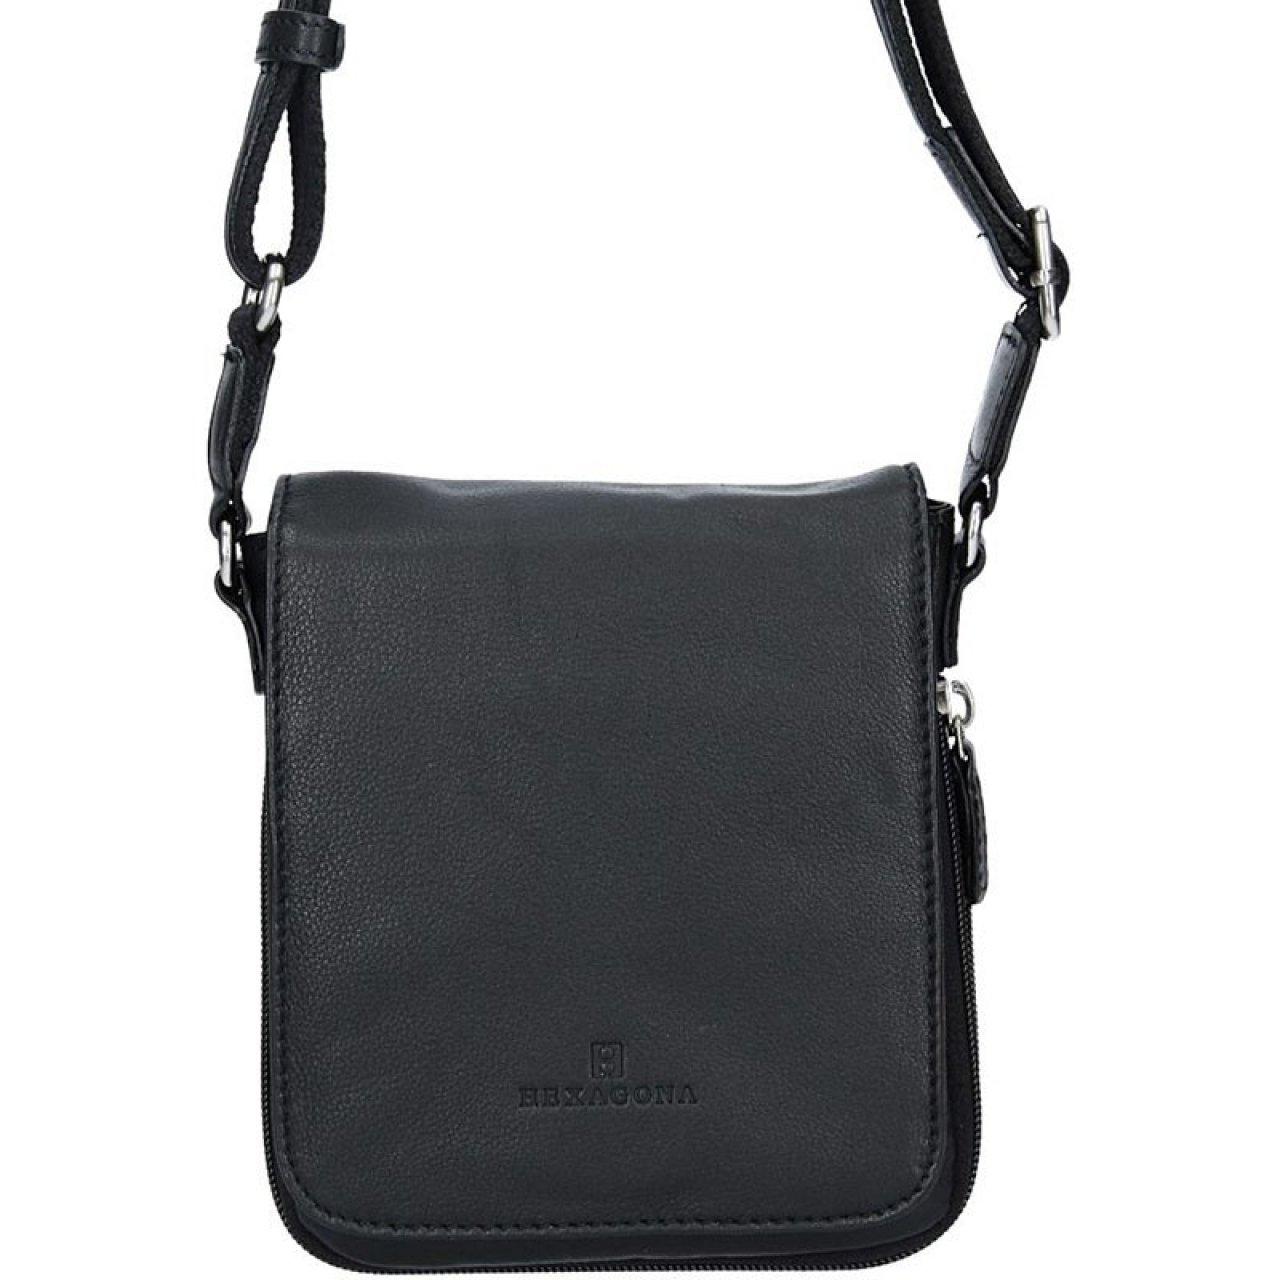 327f9cbfed Pánská kožená taška na doklady Hexagona Ernest - černá